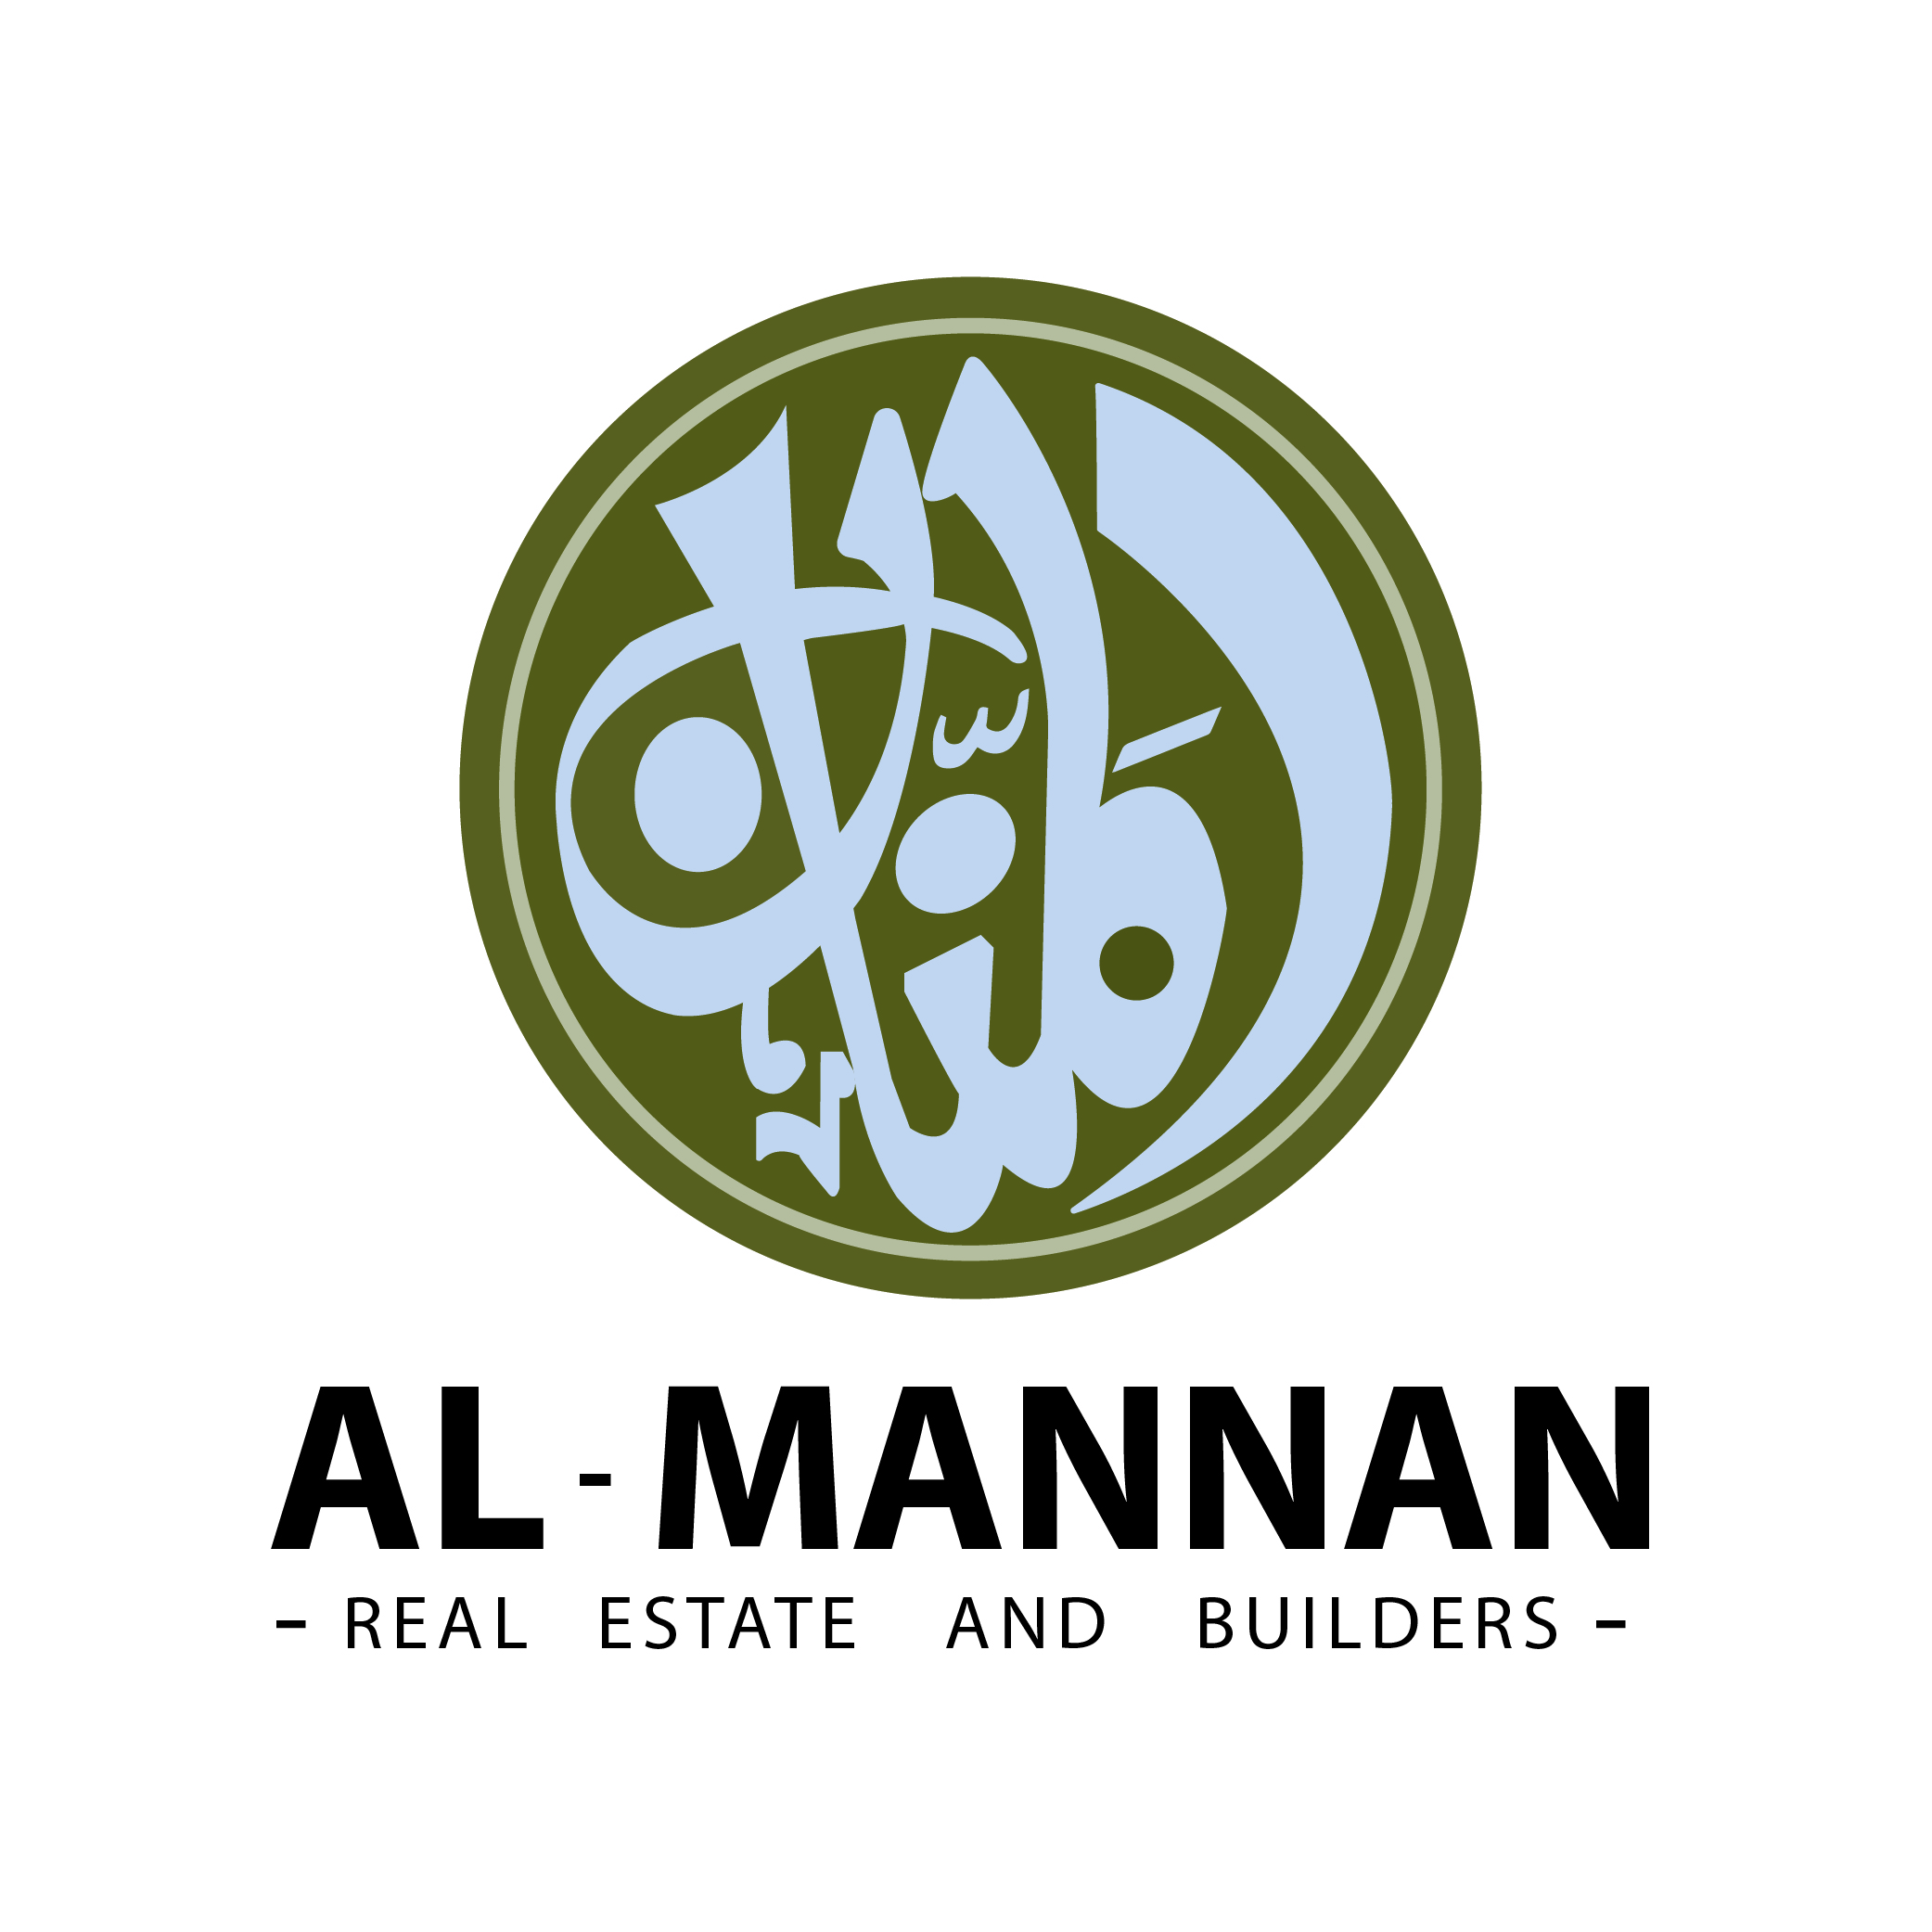 Al-Mannan Real Estate